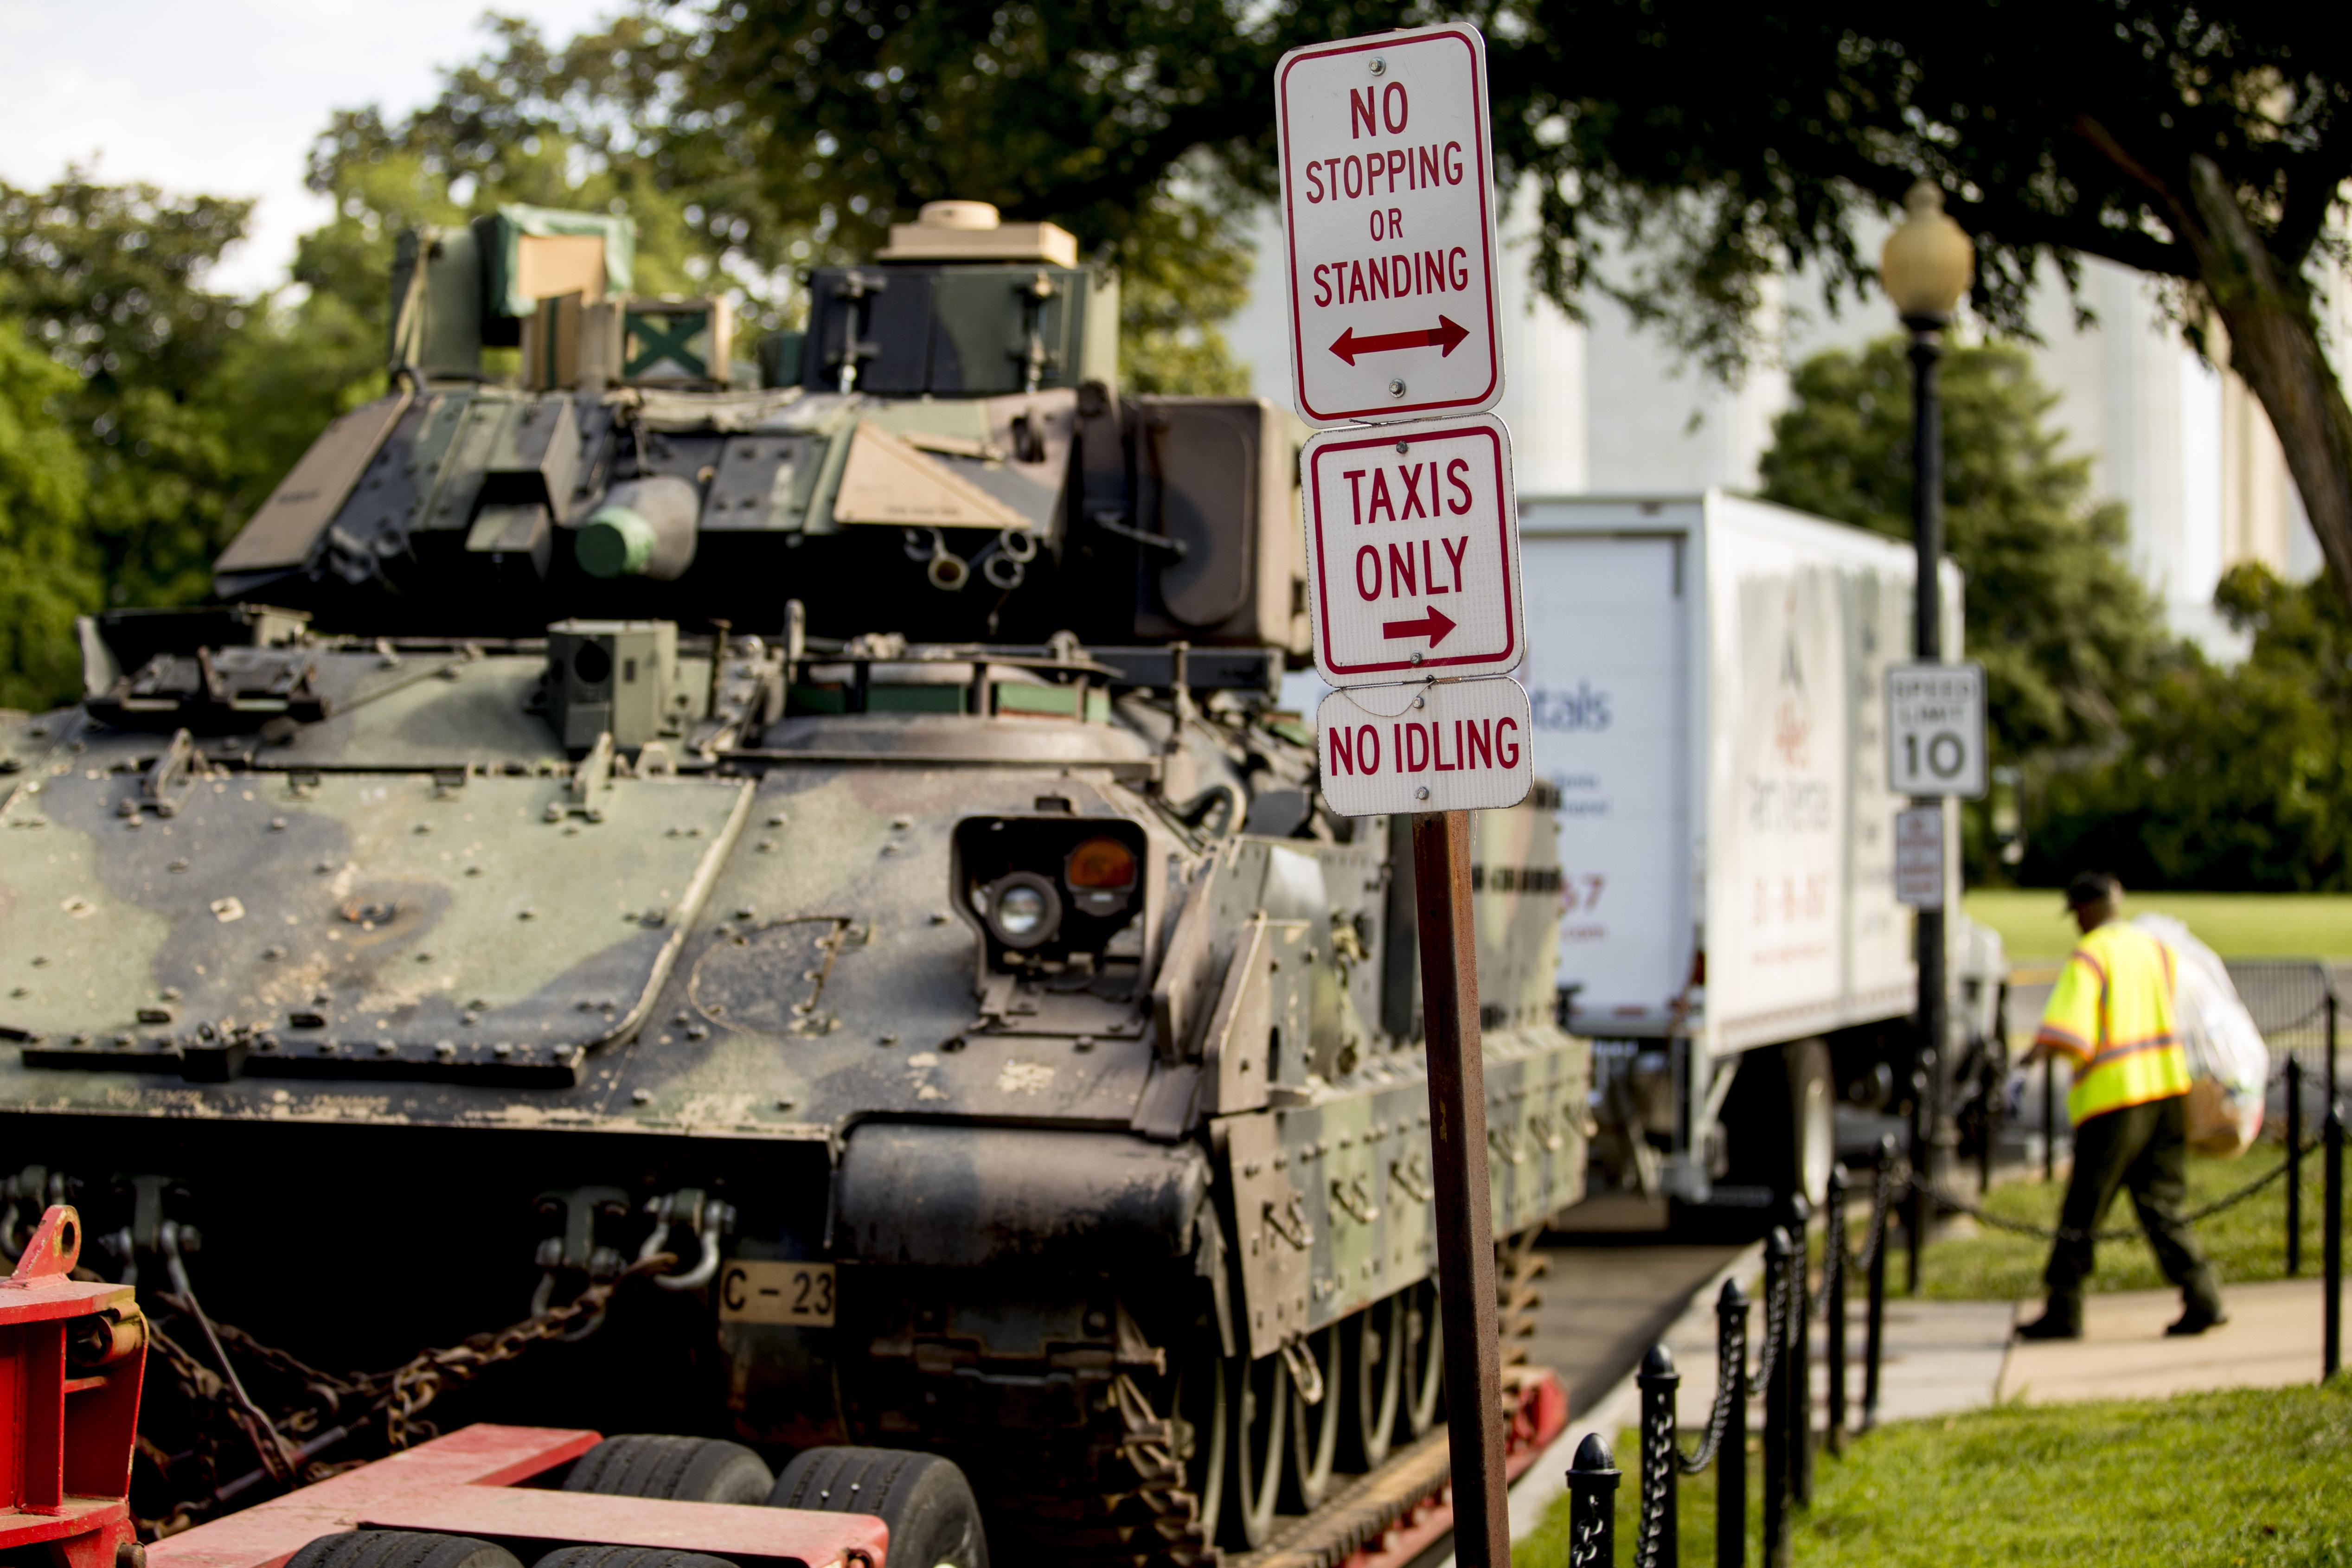 Trump touts July 4 military salute; critics see politics